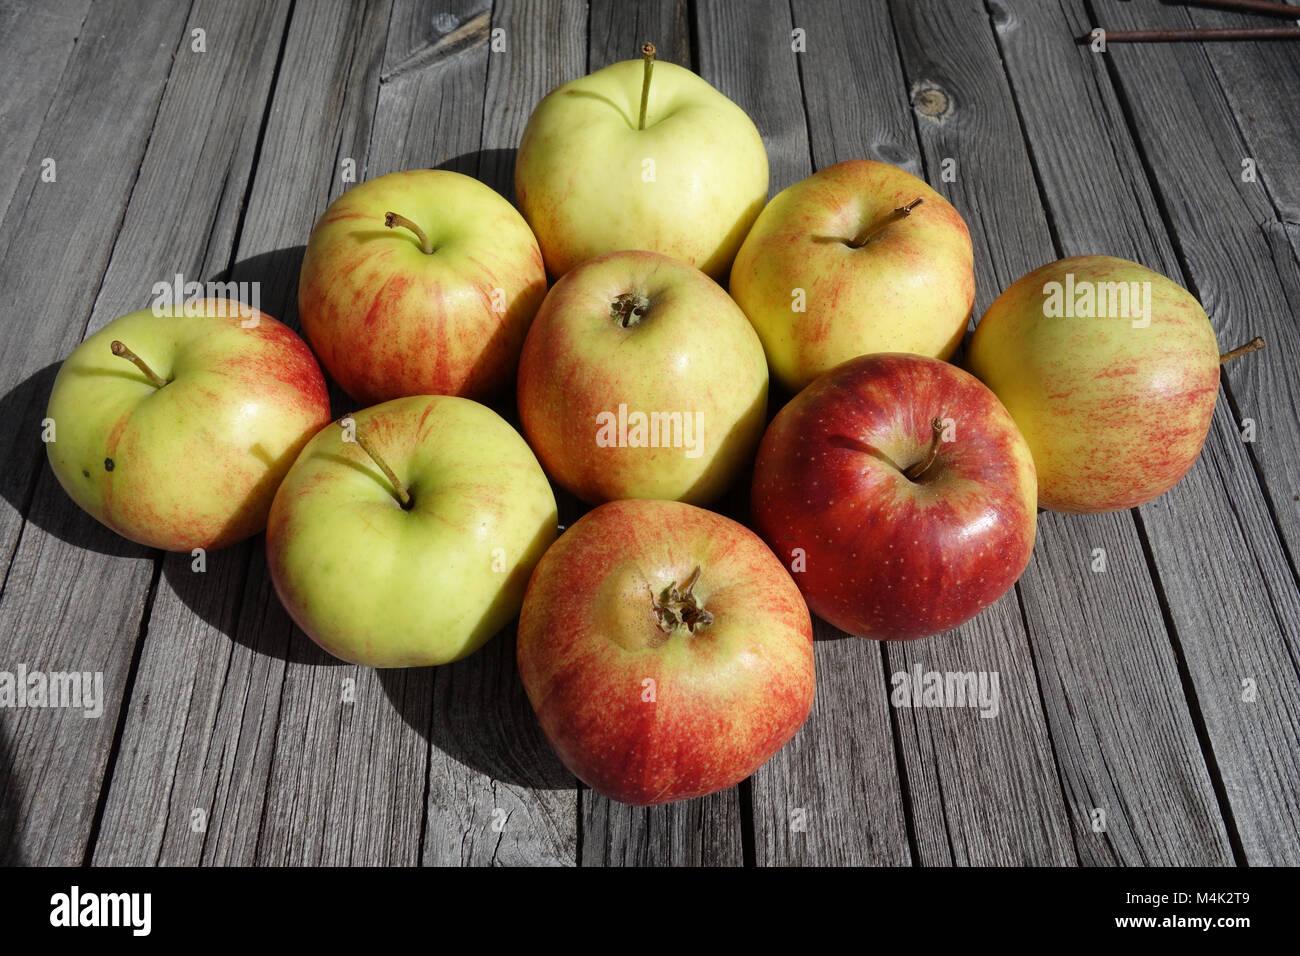 Malus domestica Jonagored, apple-sort - Stock Image